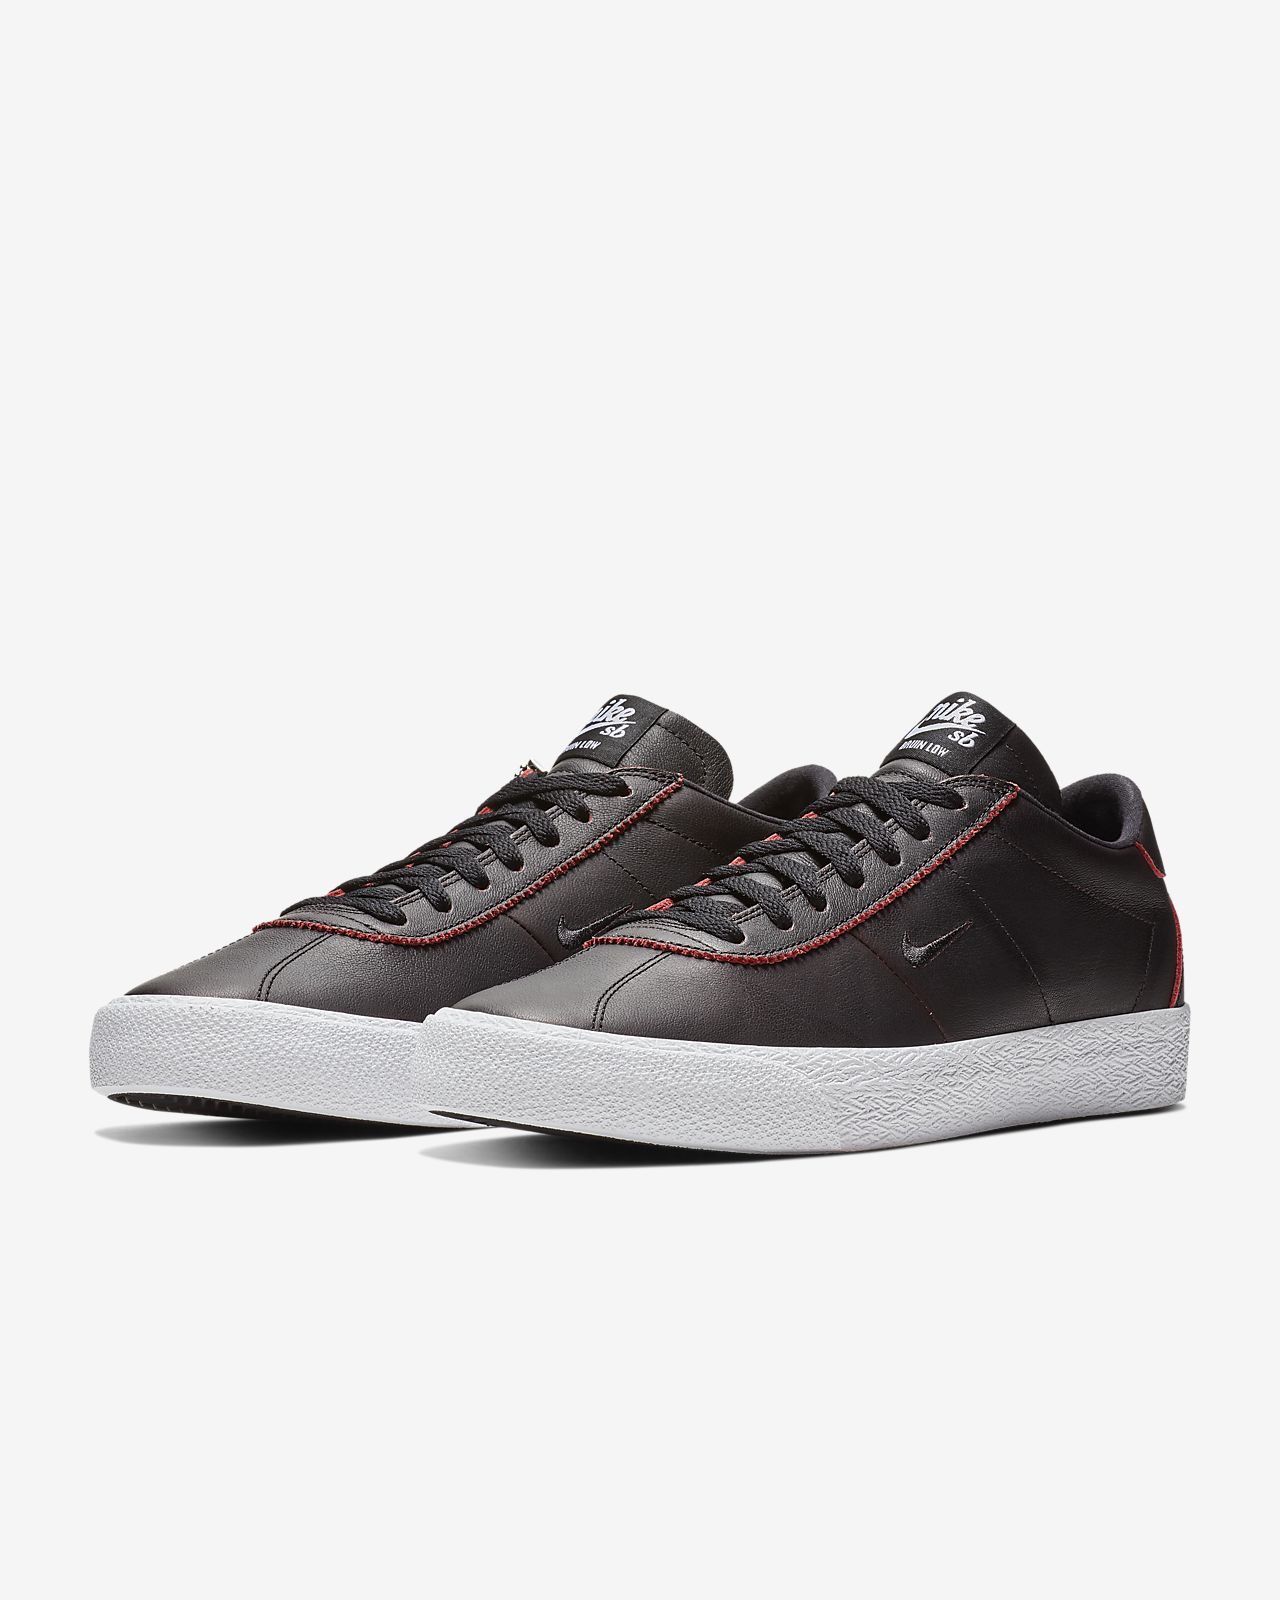 competitive price 0c726 d7e0a ... Nike SB Zoom Bruin NBA Skate Shoe